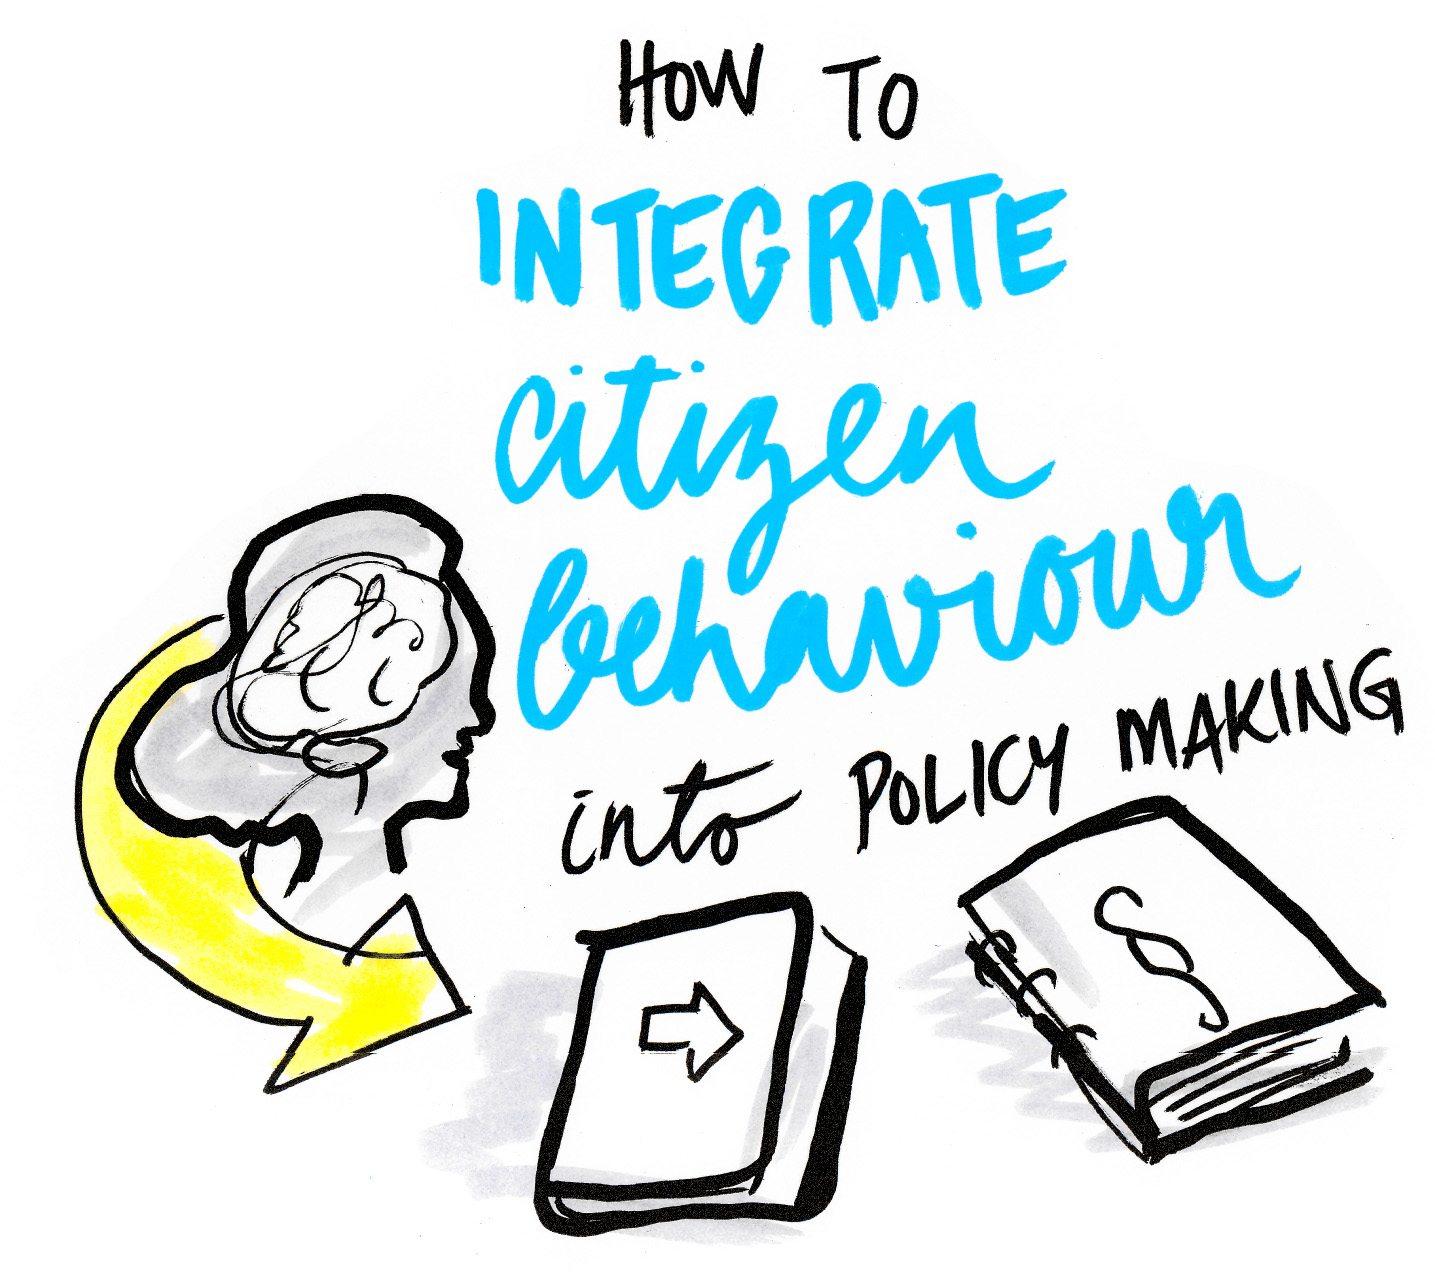 Integrate Citizen Behaviour (Hi)